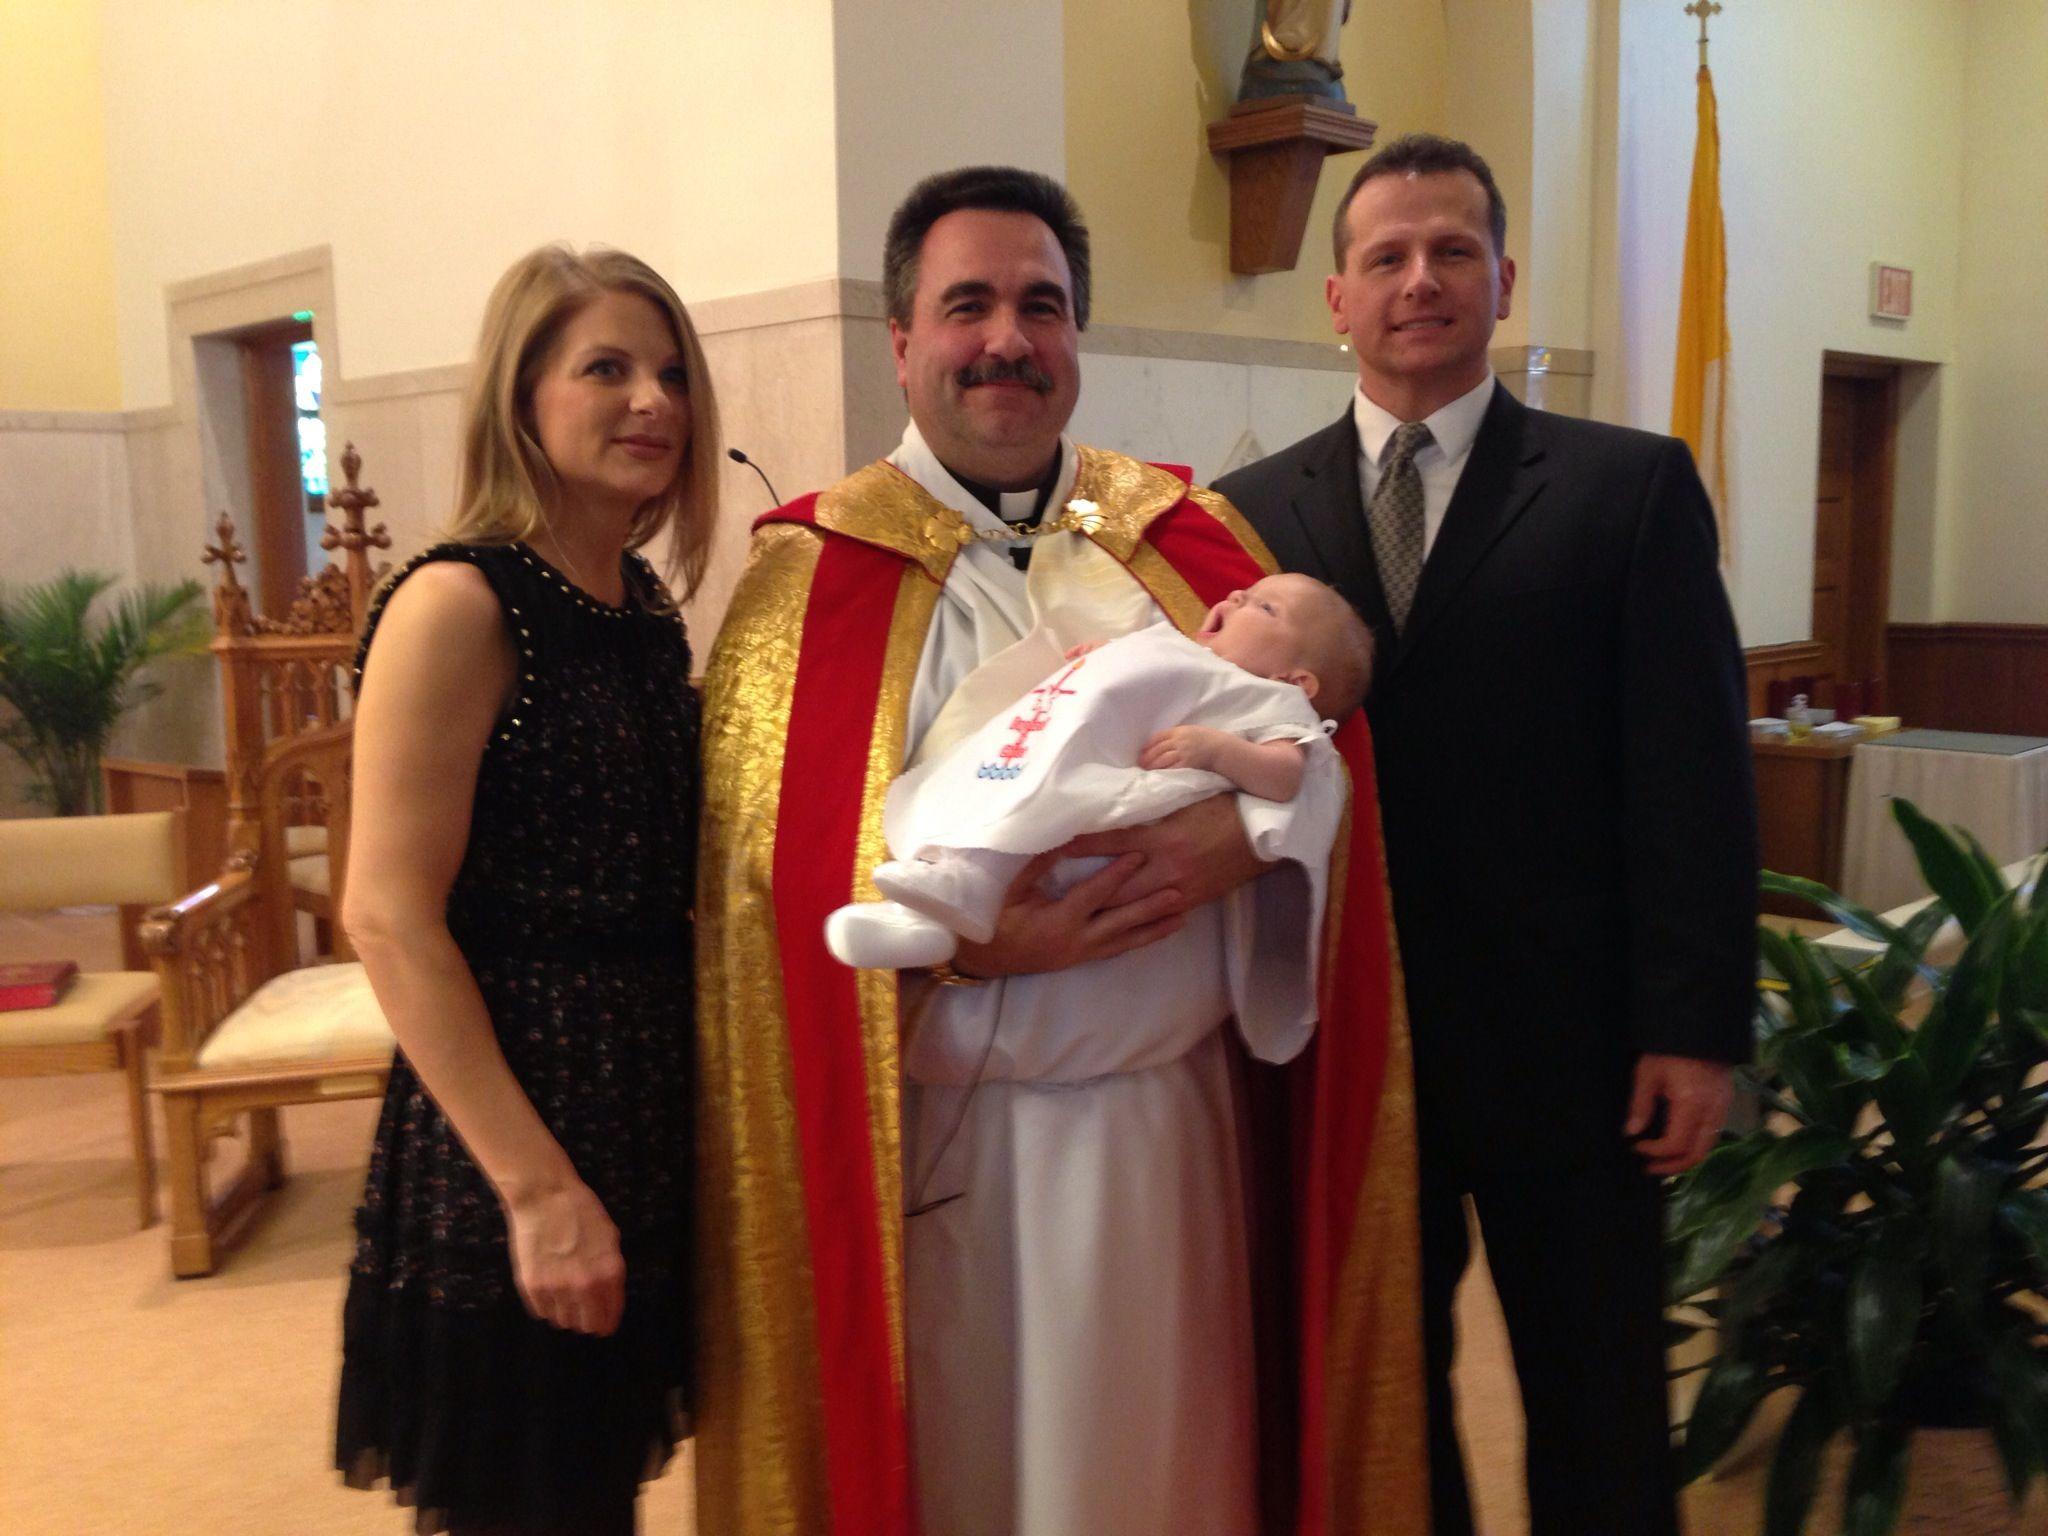 olivia grace tammaro baptized st margaret s church baptized st margaret s church burlington ma daughter of derek and jaime